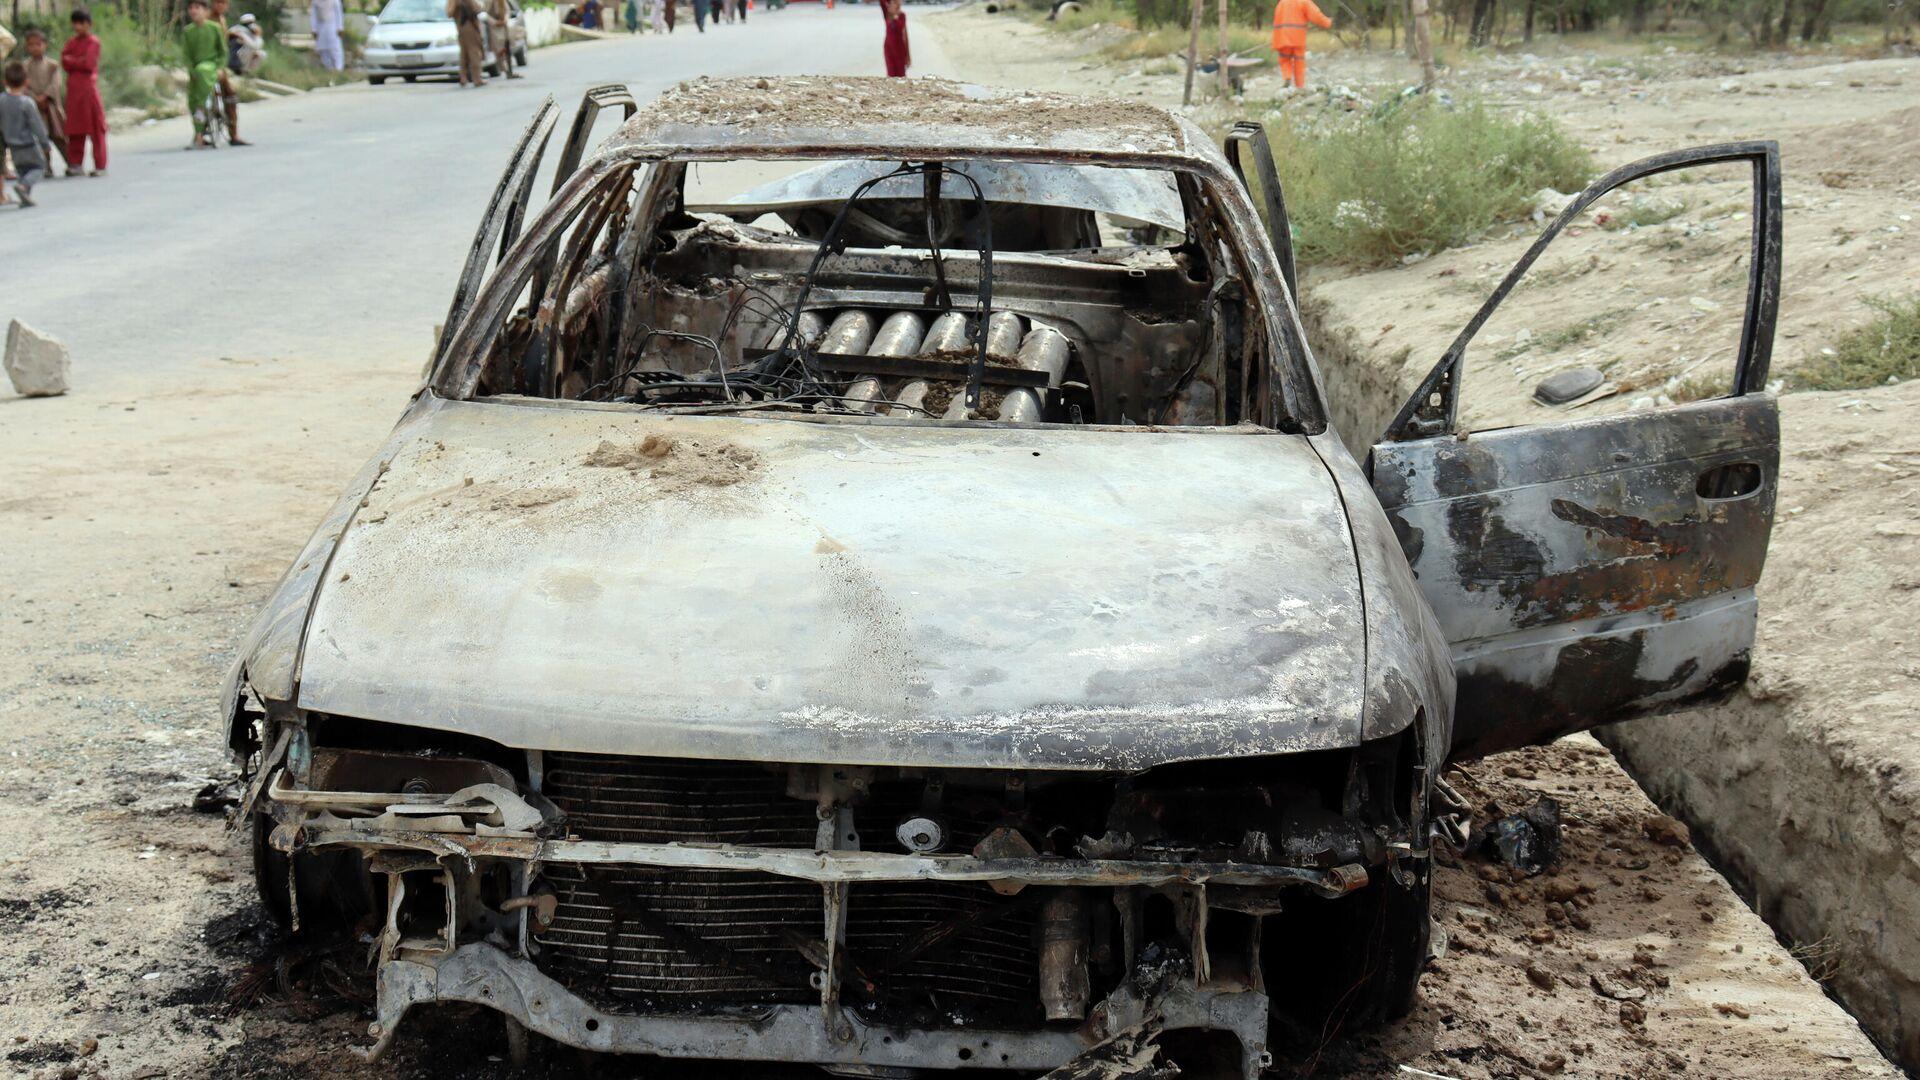 Взорванный автомобиль в Кабуле - Sputnik Узбекистан, 1920, 31.08.2021